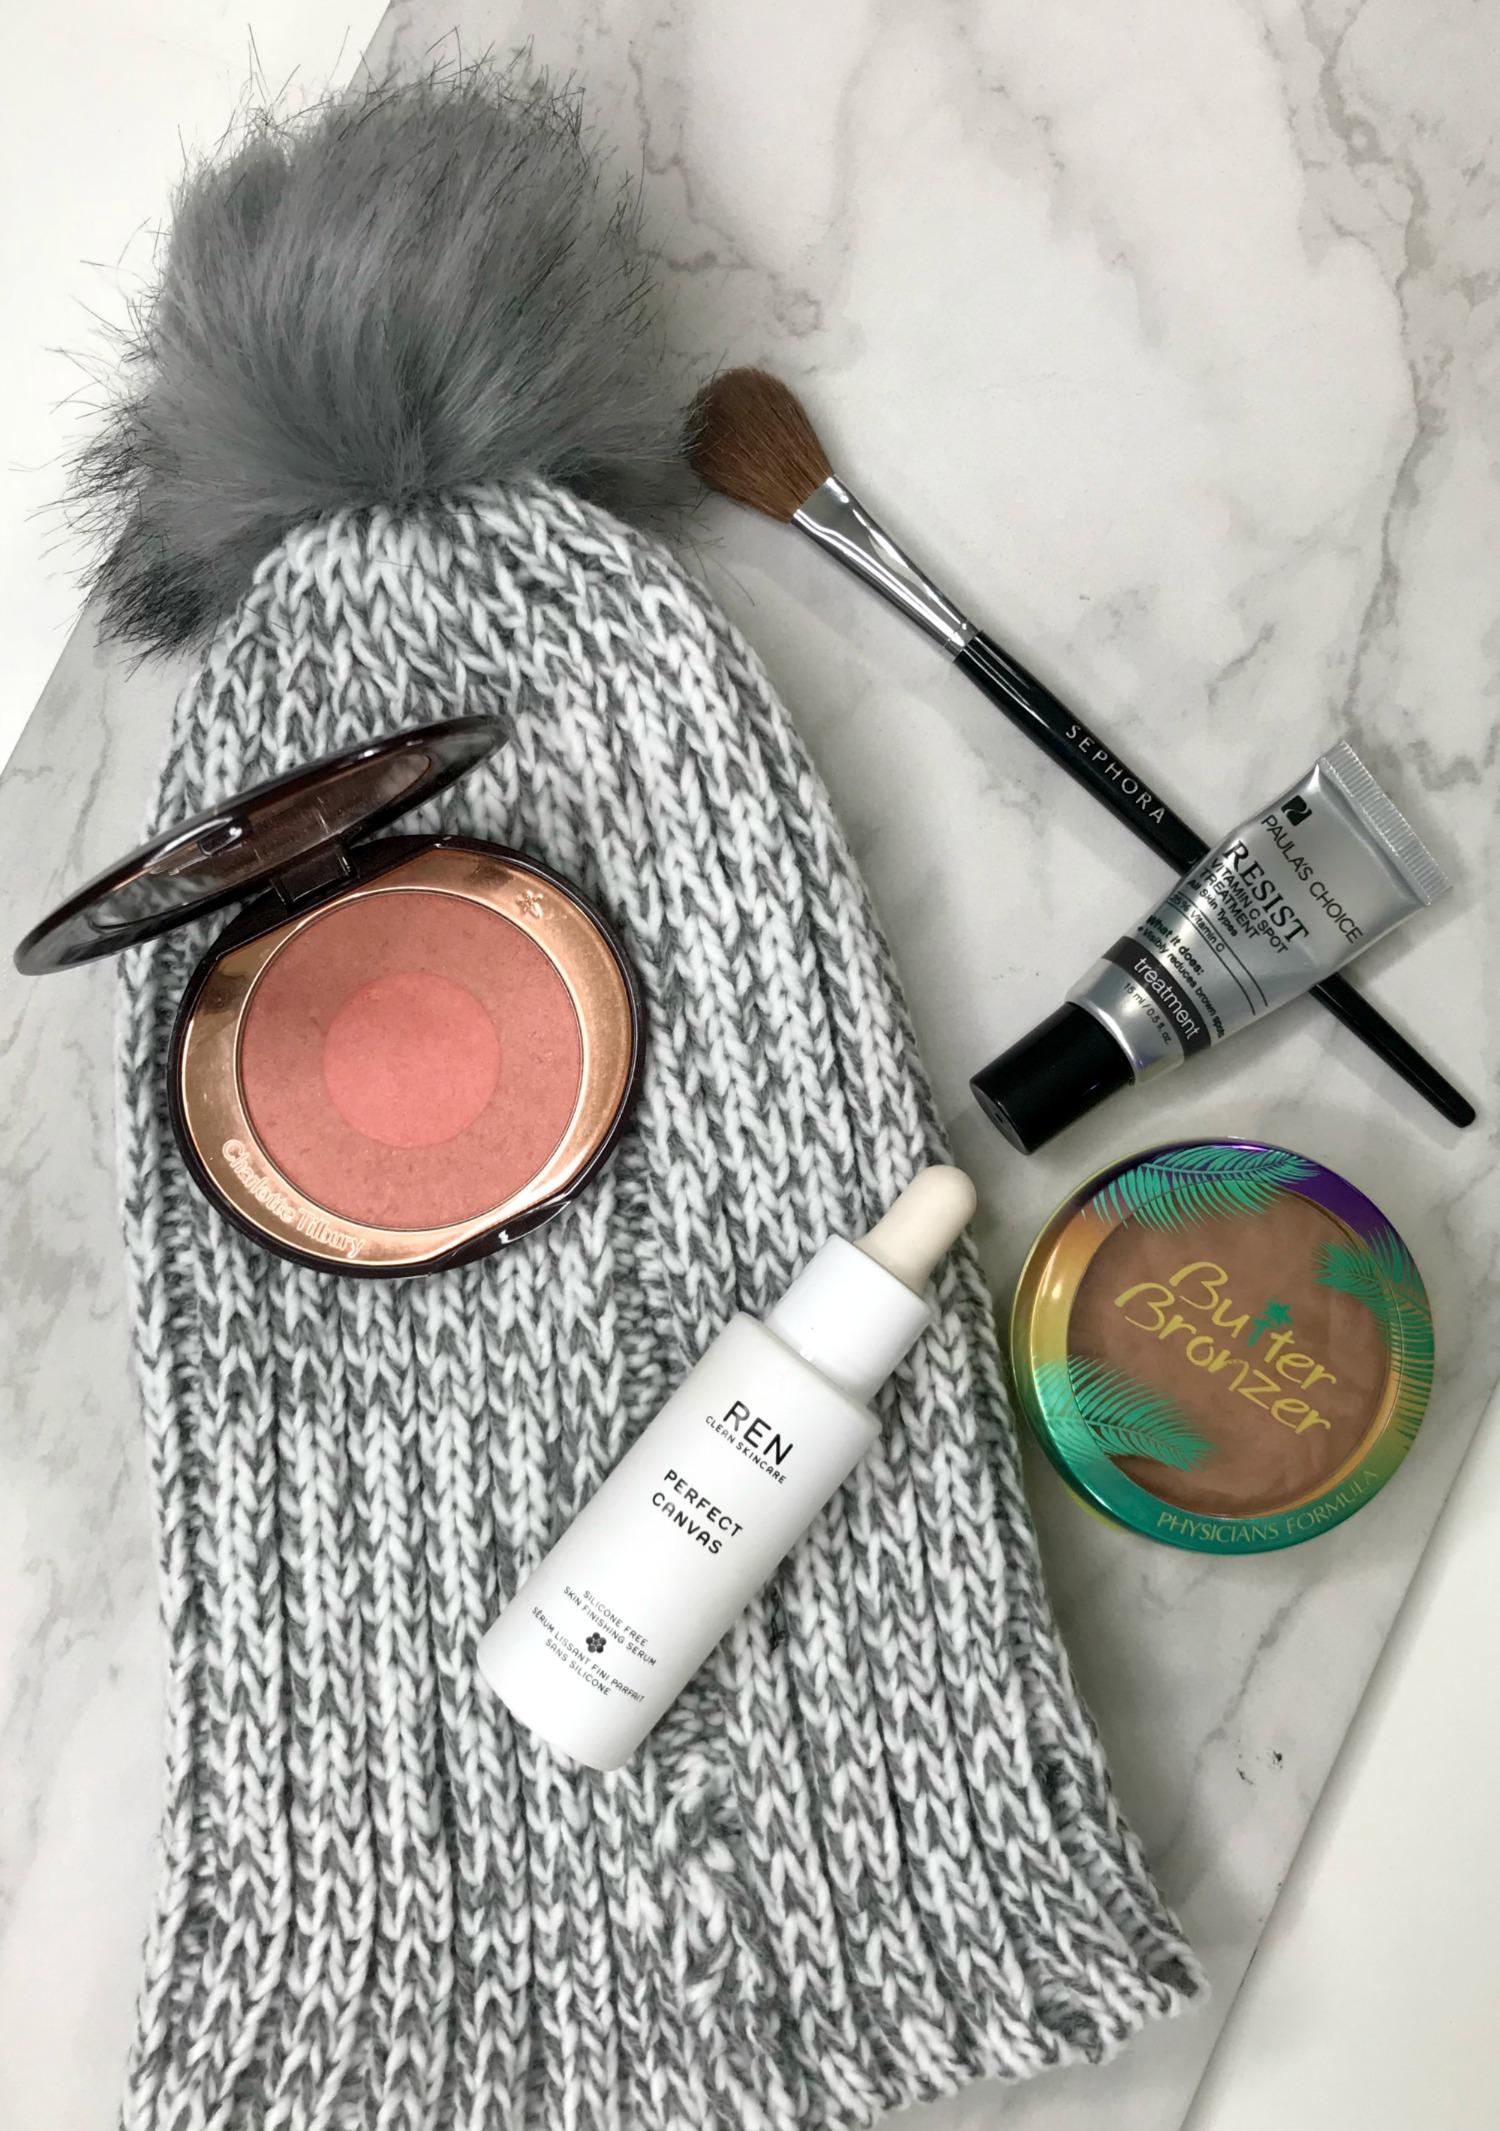 November 2017 Beauty Favorites Ren Perfect Canvas, Sephora 98 Brush, Charlotte Tilbury Ecstasy, Butter Bronzer